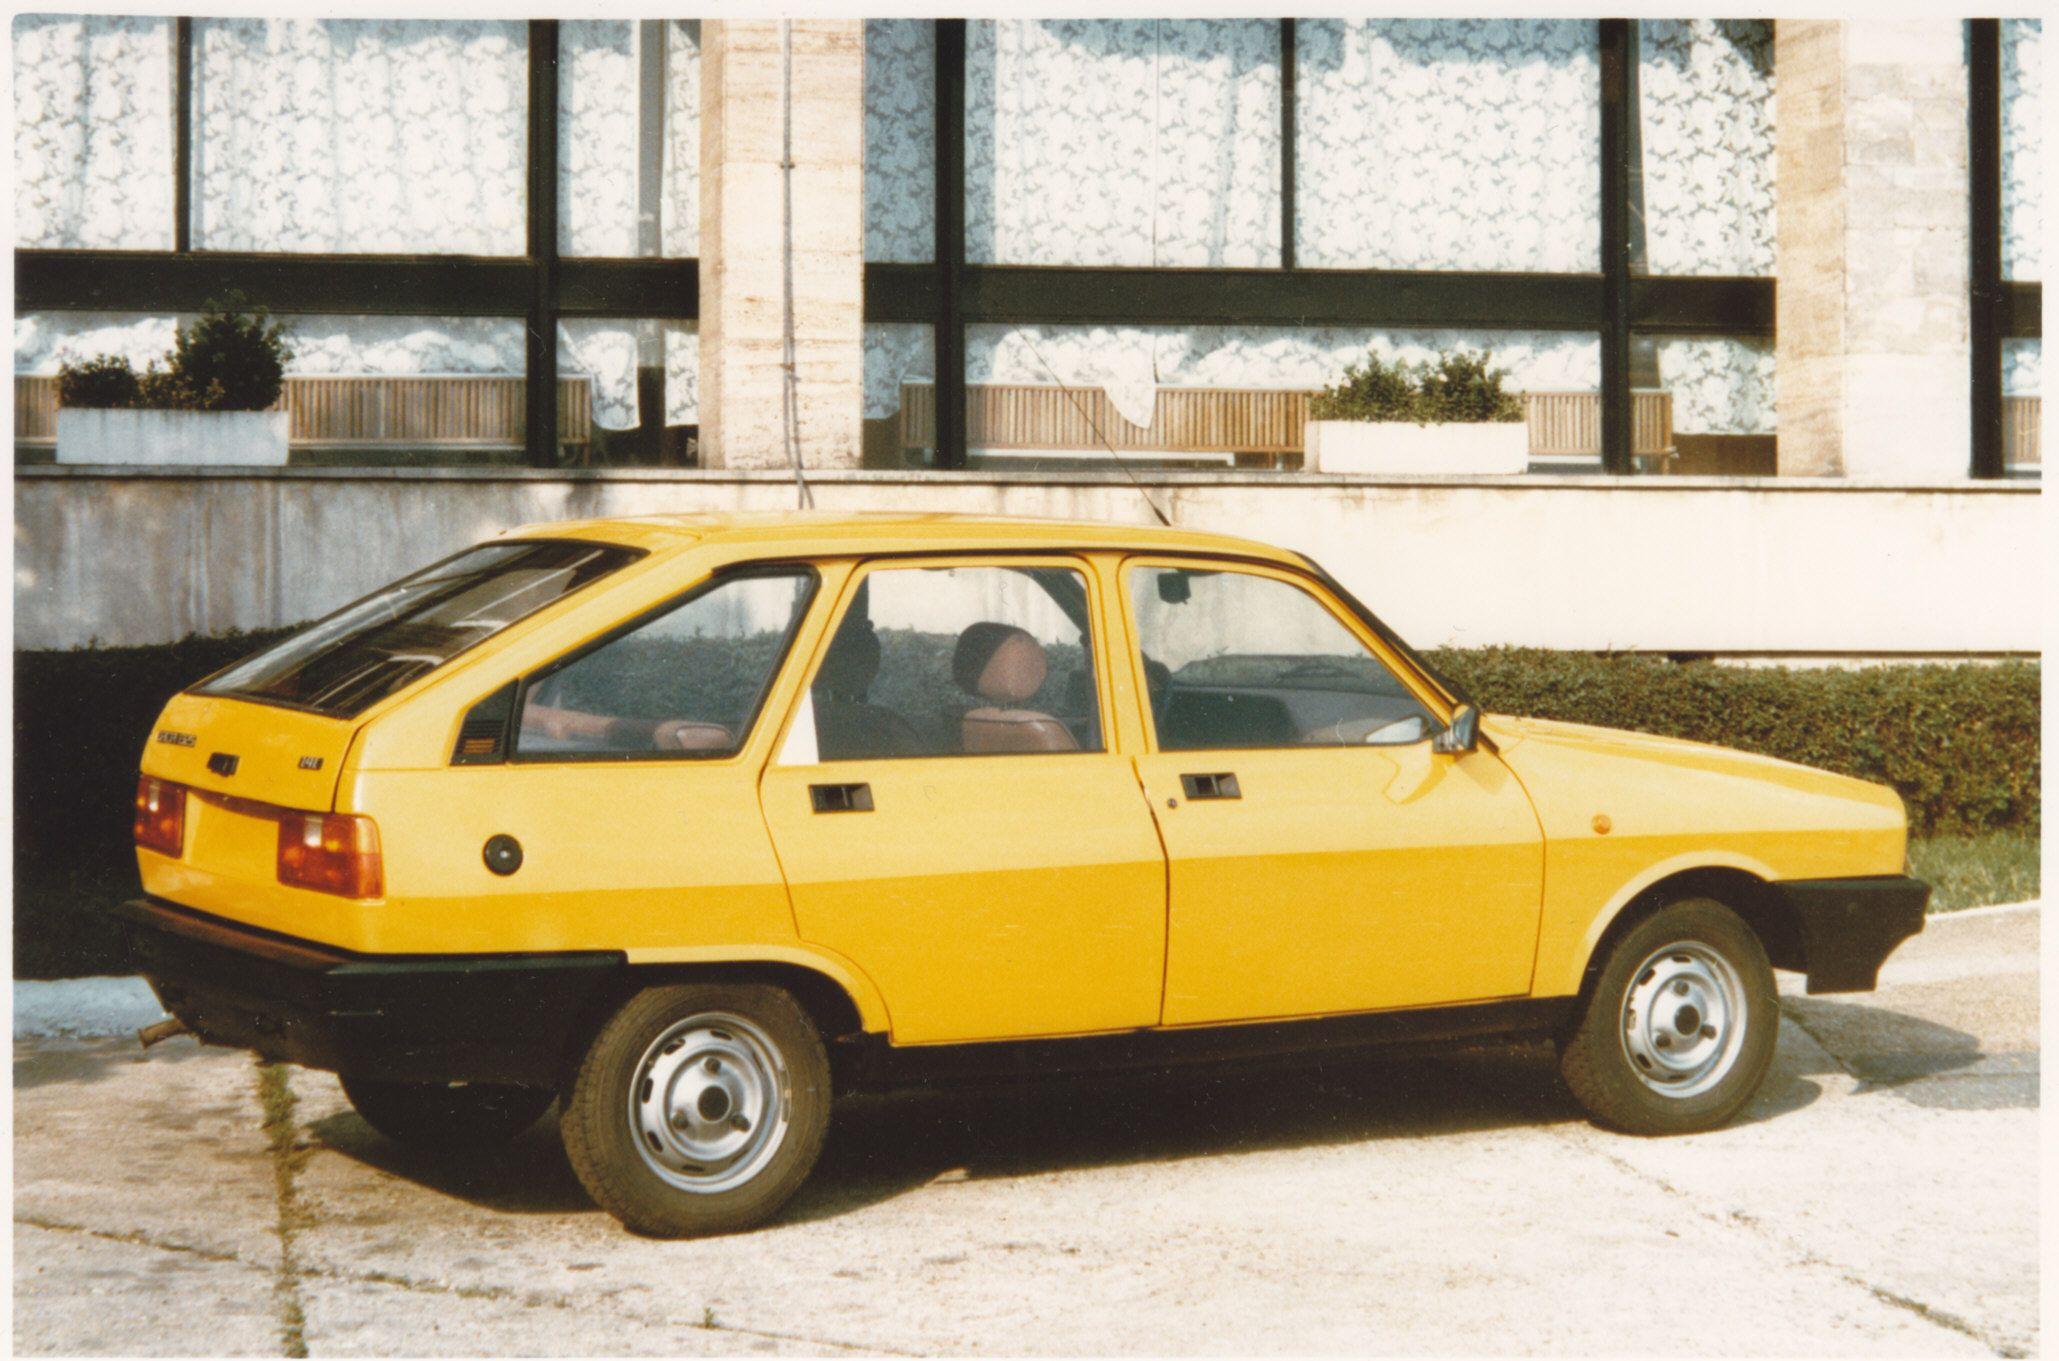 Dacia 1320 1988 pinterst com a8f1ac7811420a876011a0b6bfbb168d